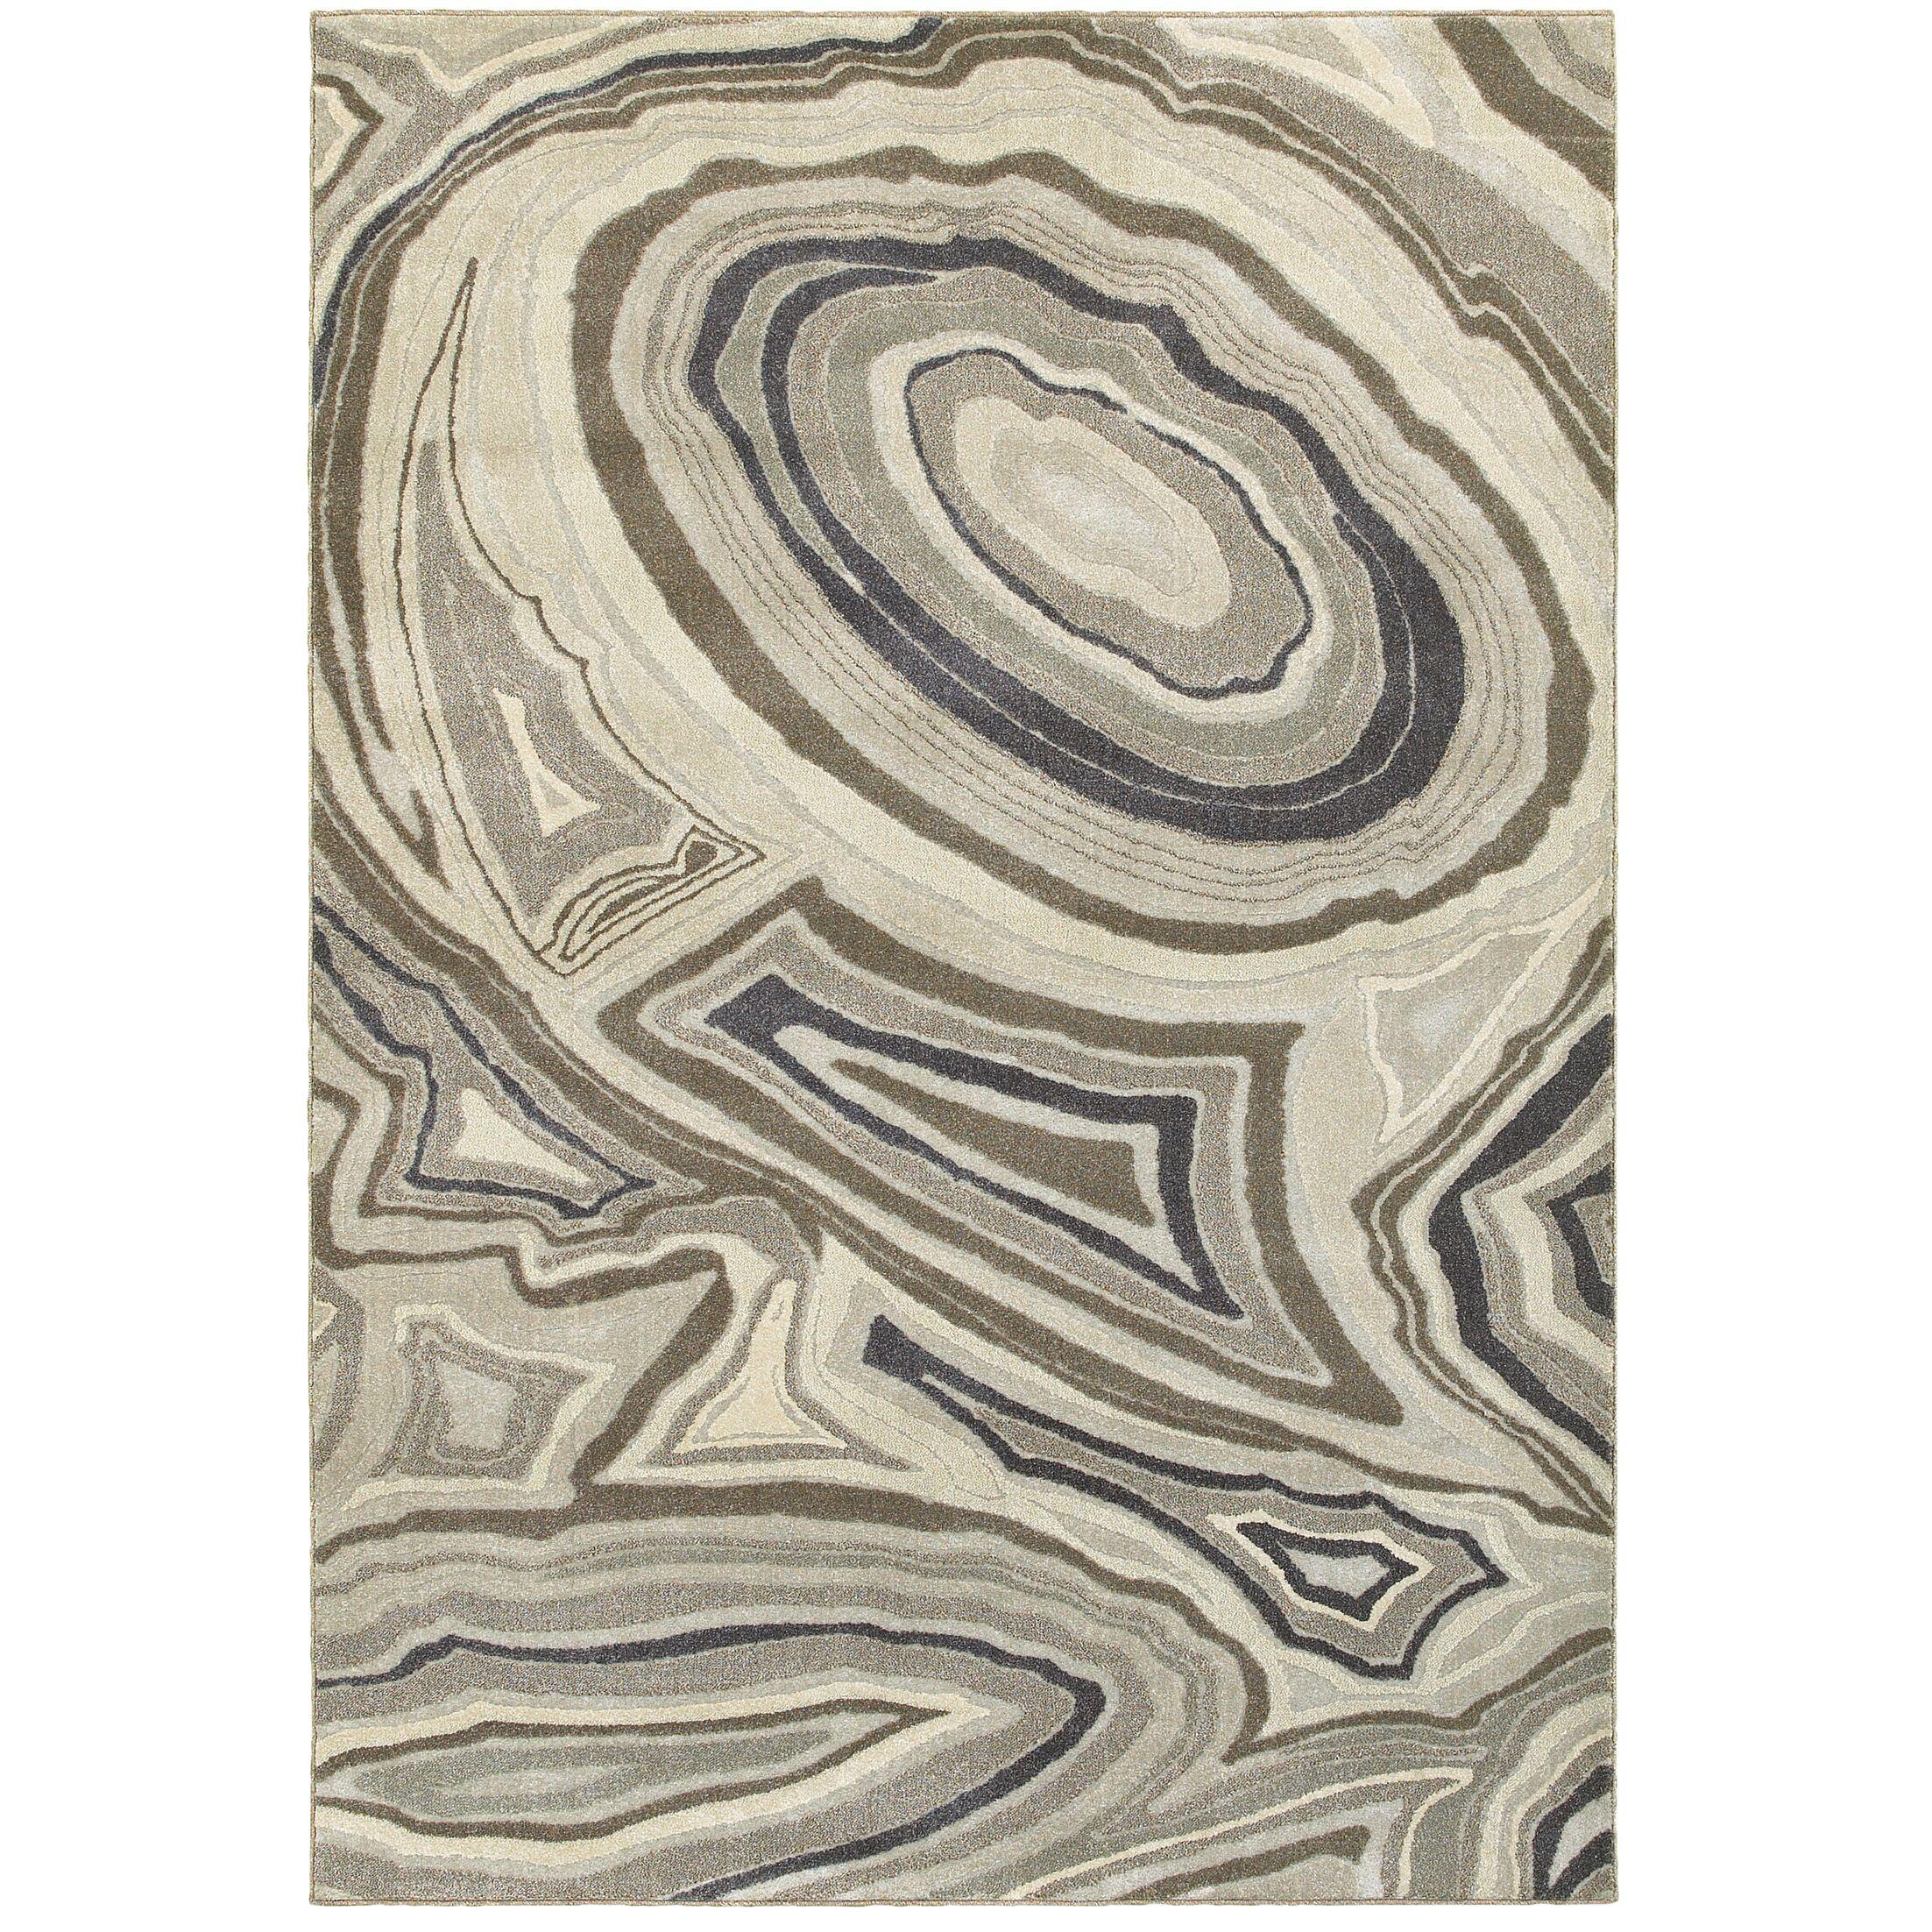 Leonidas Ivory/Gray Area Rug Size: Rectangle 6'7